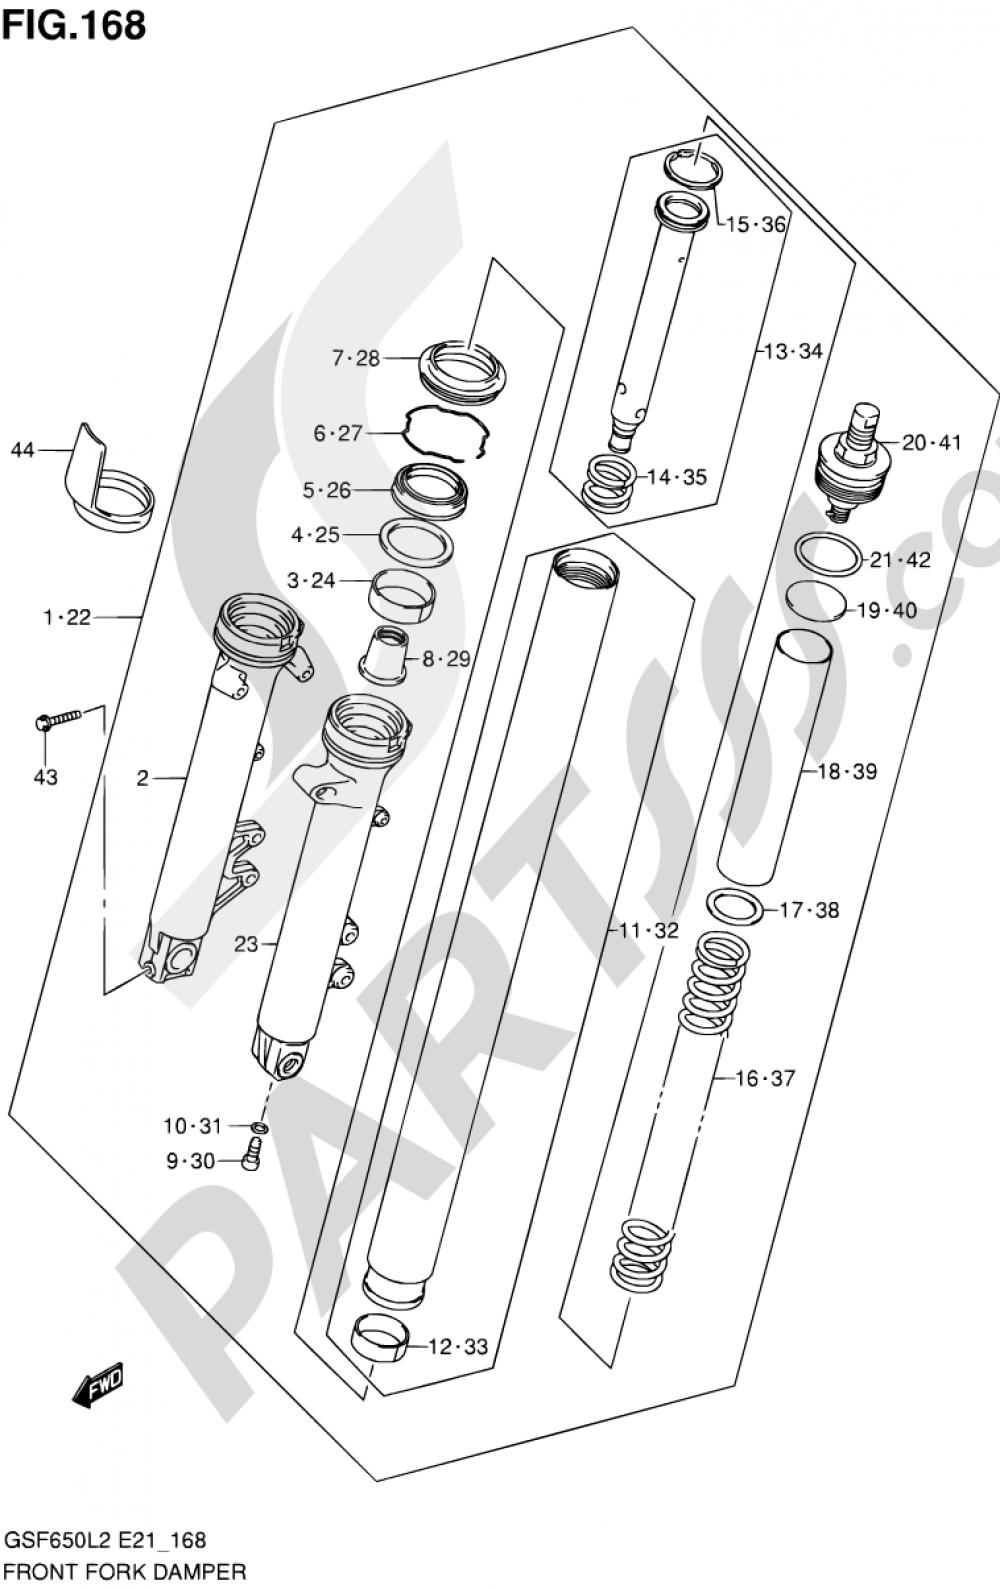 168 - FRONT FORK DAMPER (GSF650L2 E21) Suzuki BANDIT GSF650S 2012